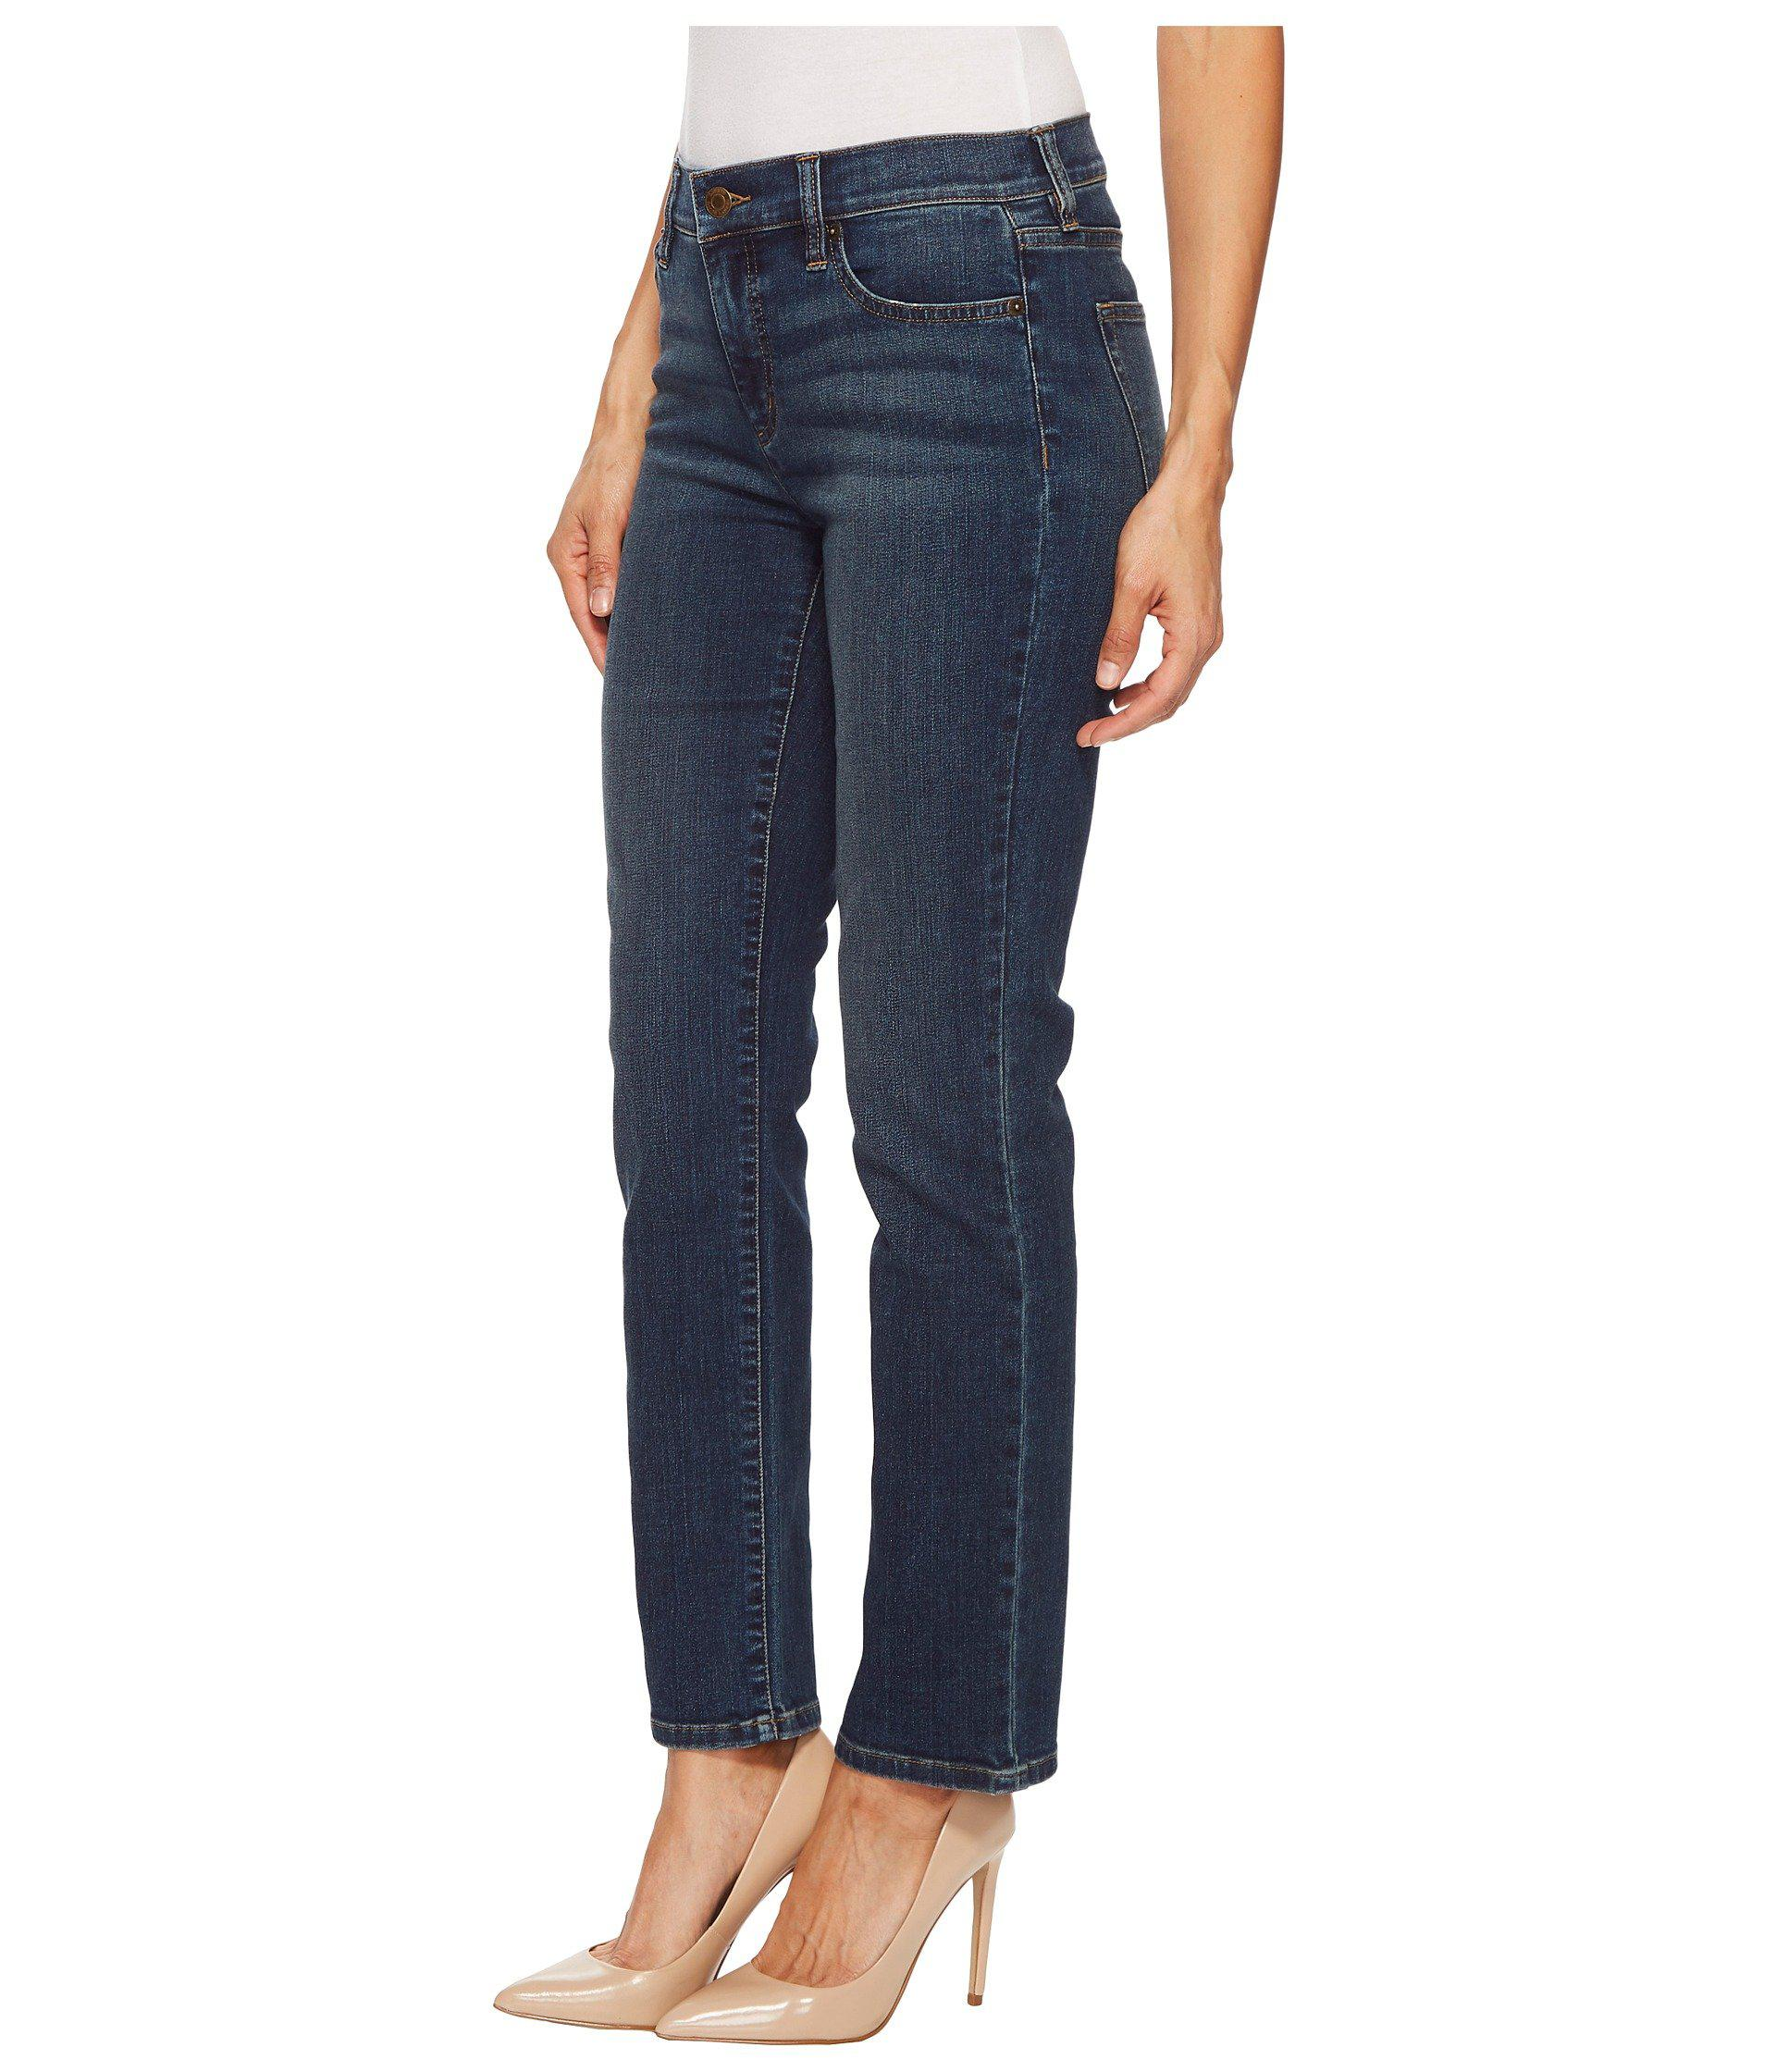 f00b260530557 Lyst - Lauren By Ralph Lauren Petite Slimming Classic Straight Jeans  (harbor Wash) Women s Jeans in Blue